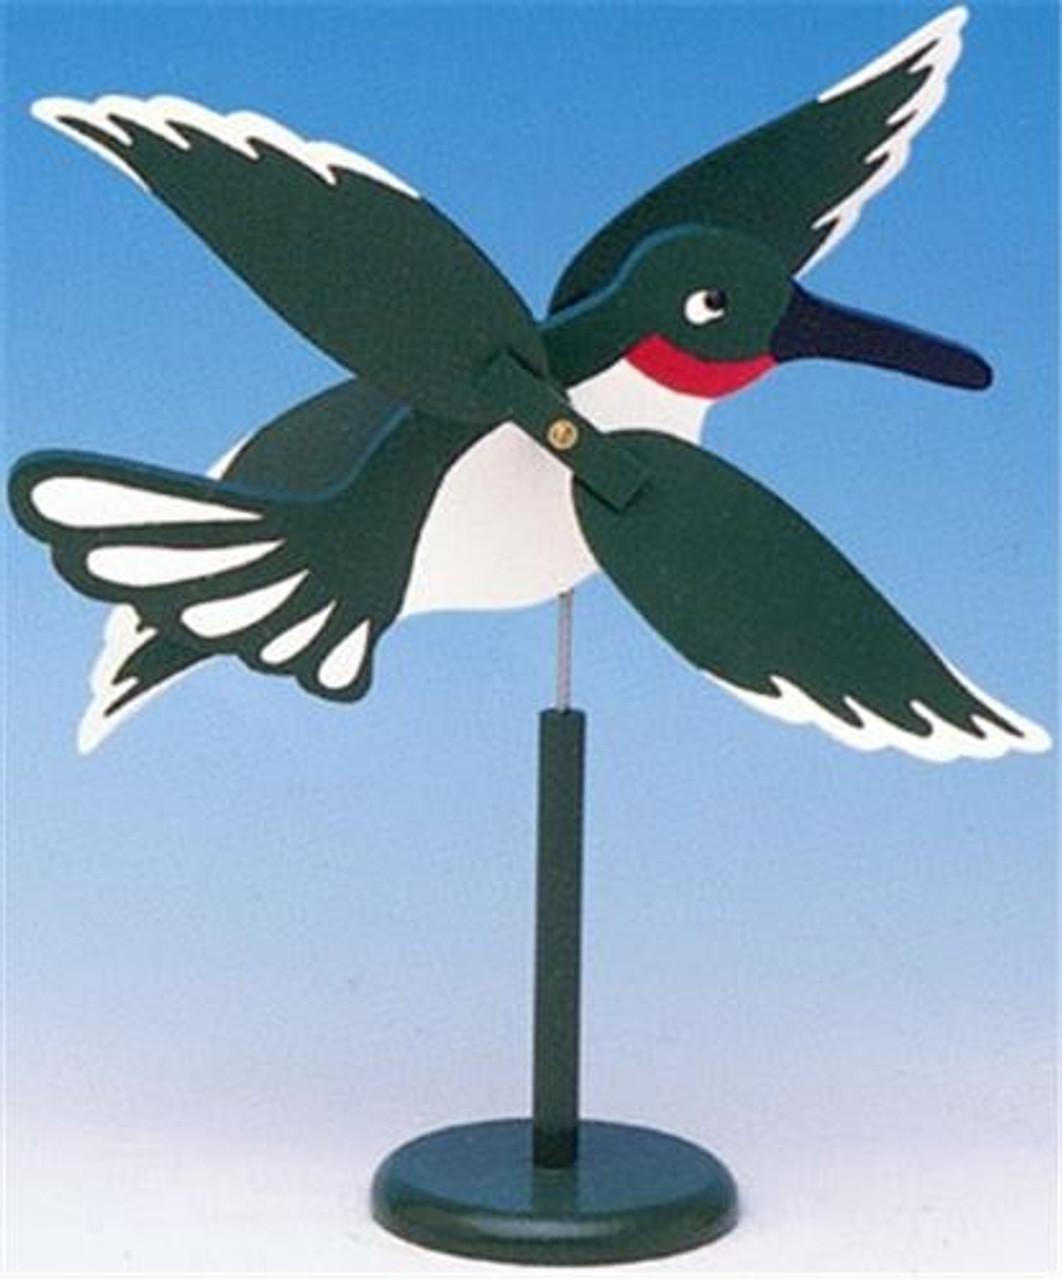 Cherry Tree Toys Hummingbird Whirligig Hardware Kit